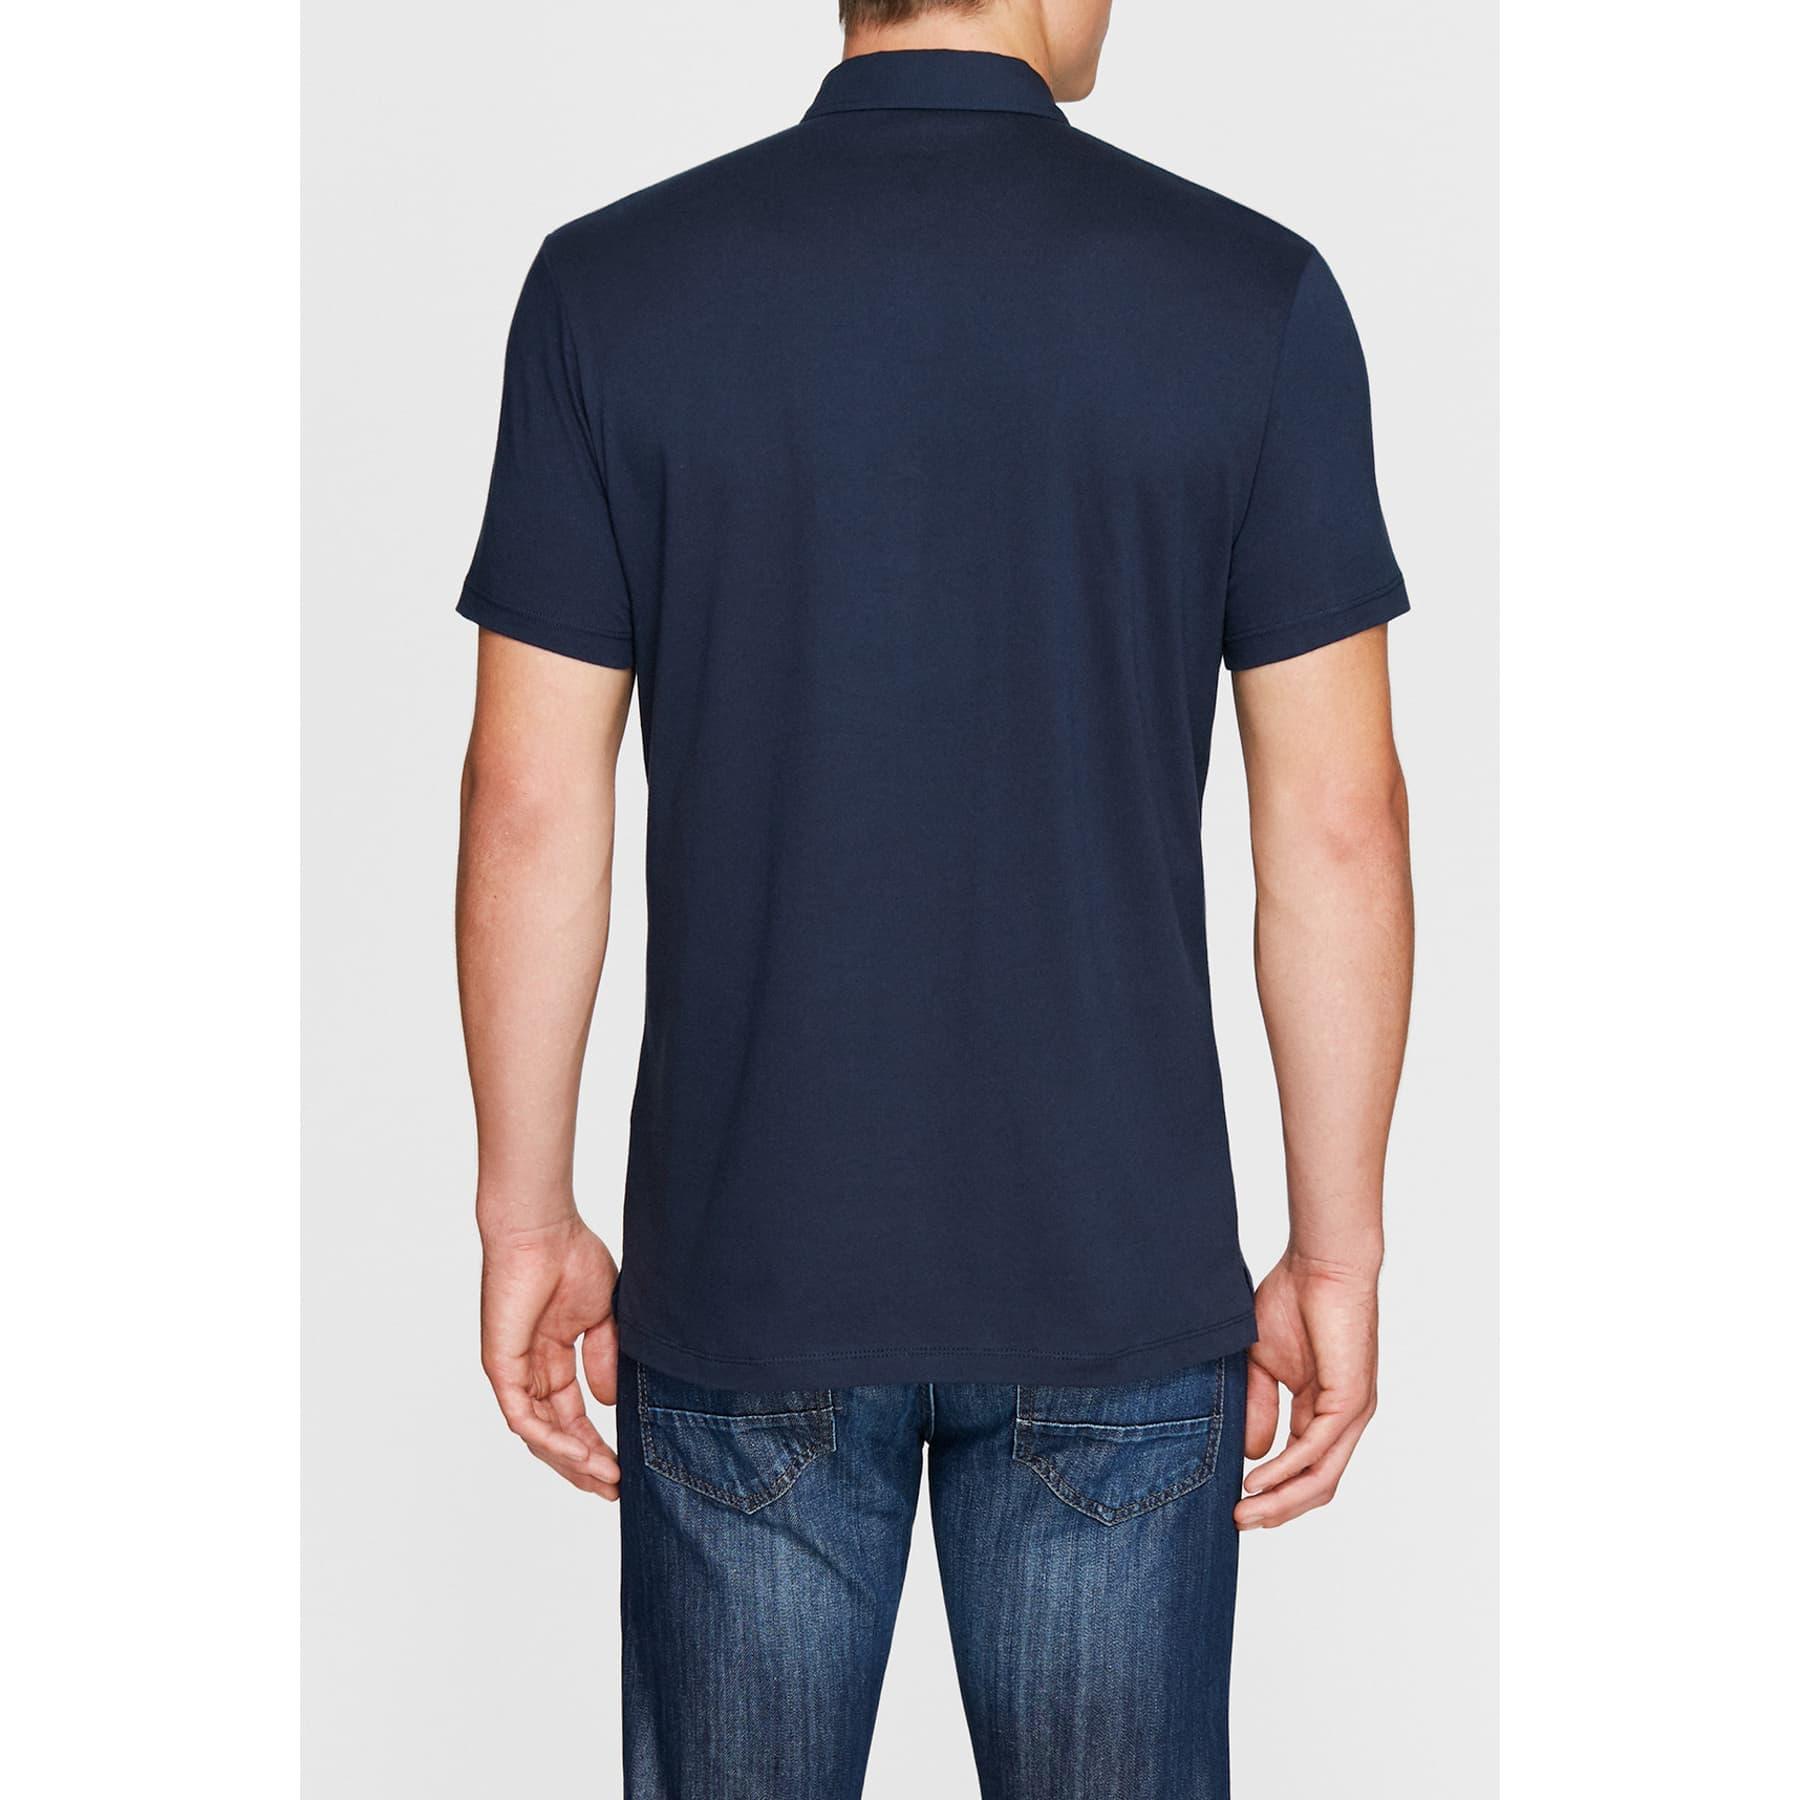 Mavi Jeans Erkek Lacivert Polo Yaka Tişört